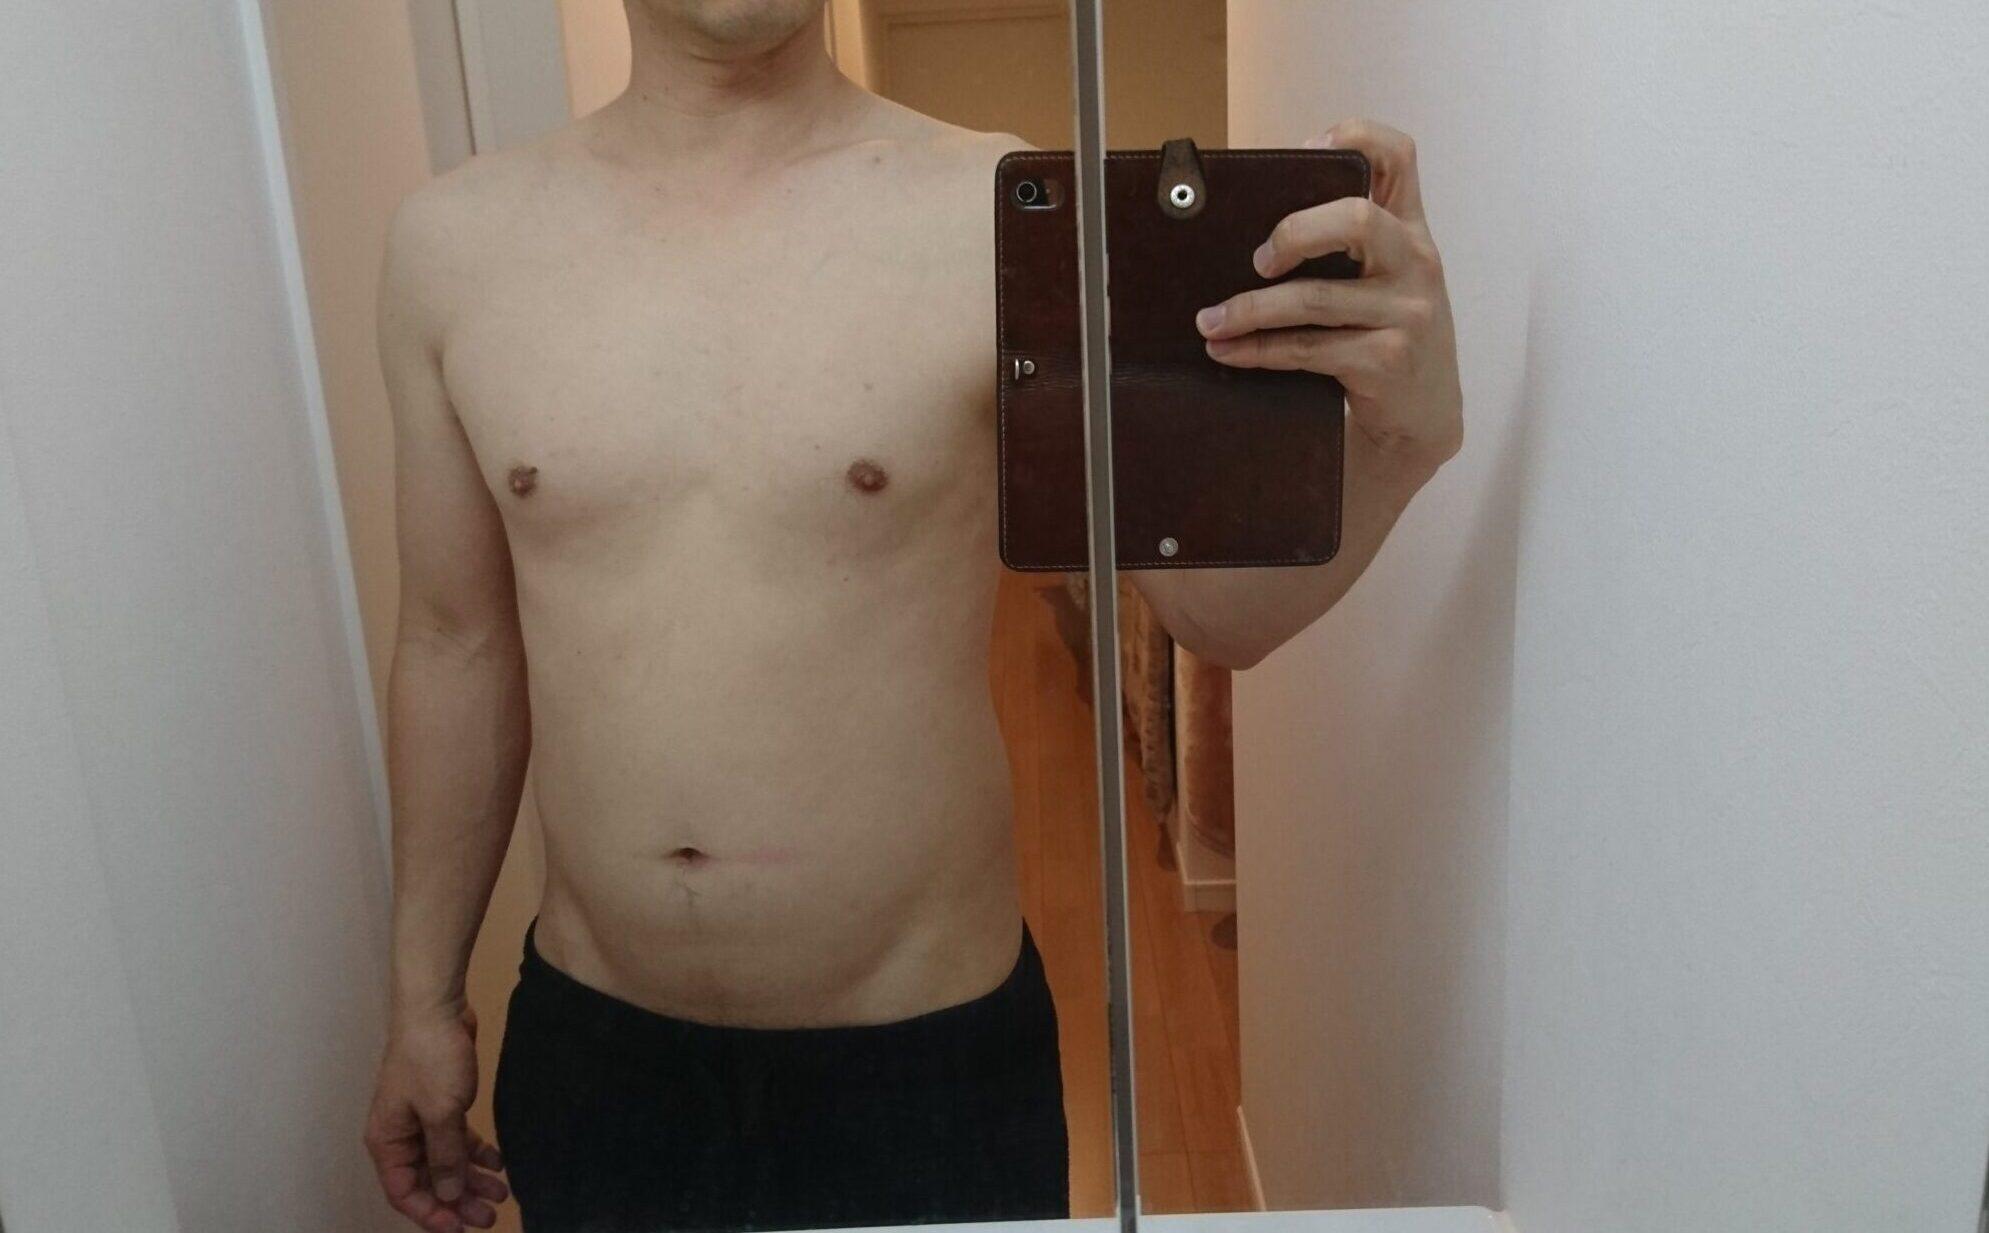 SOELU ヨガ 男性 ダイエット 痩せる 中年